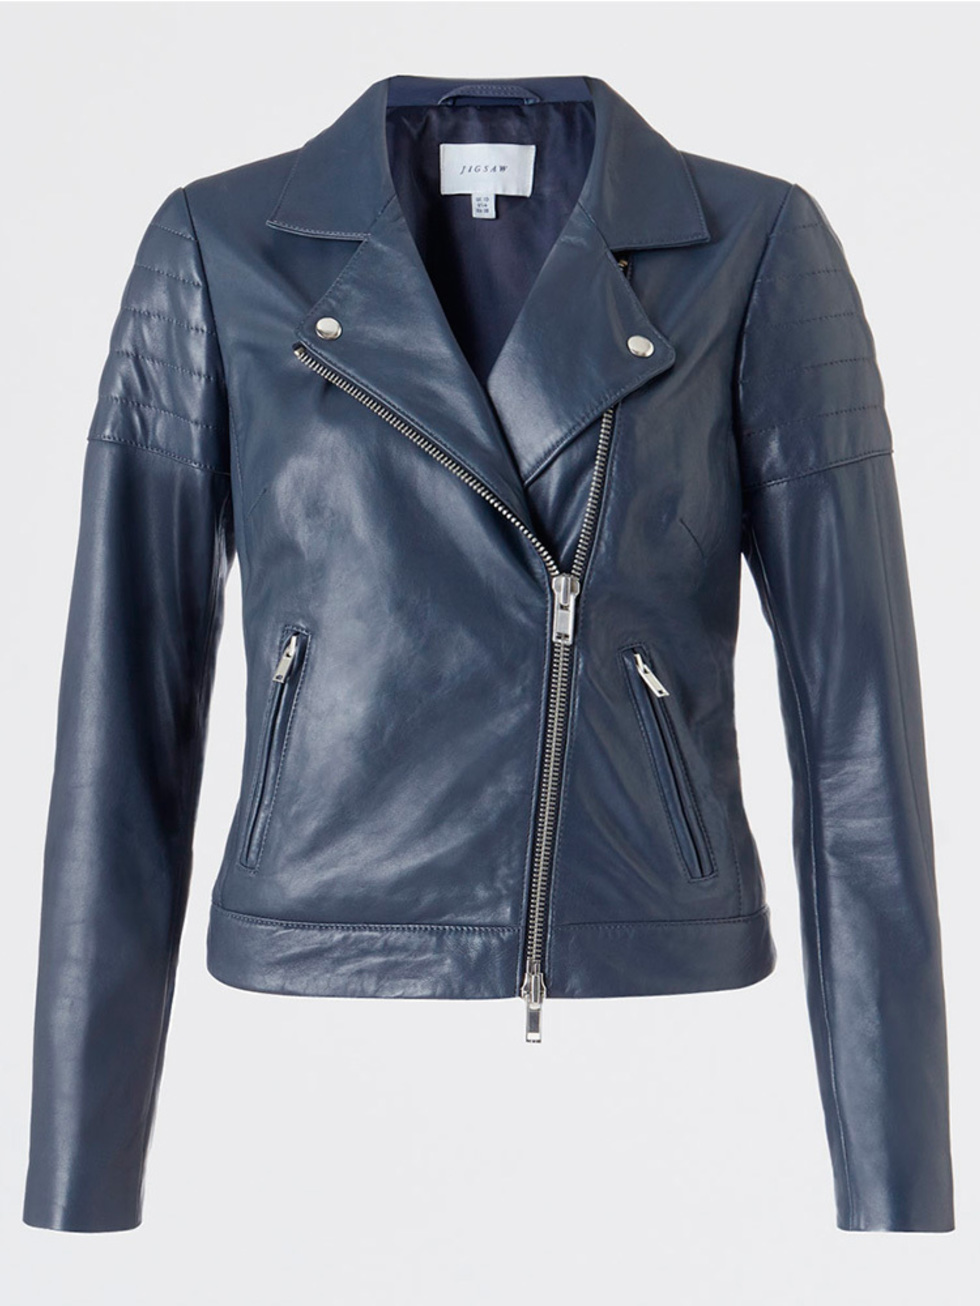 Leather jacket jigsaw - Leather Jacket Jigsaw 30